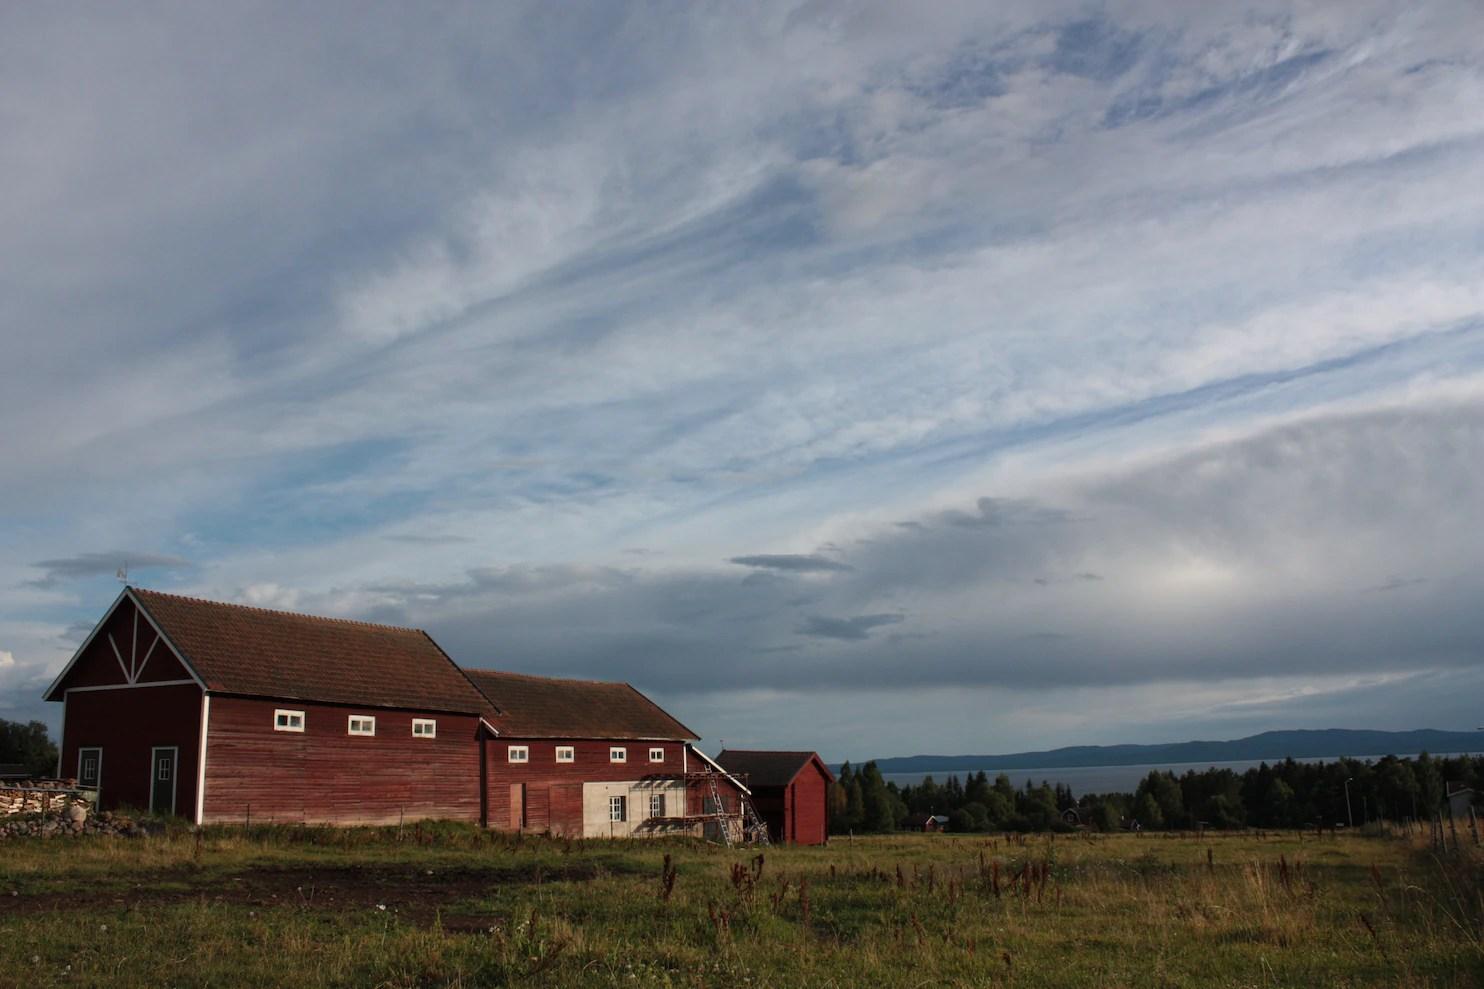 In Dalarna a bit of America in Sweden  The Washington Post